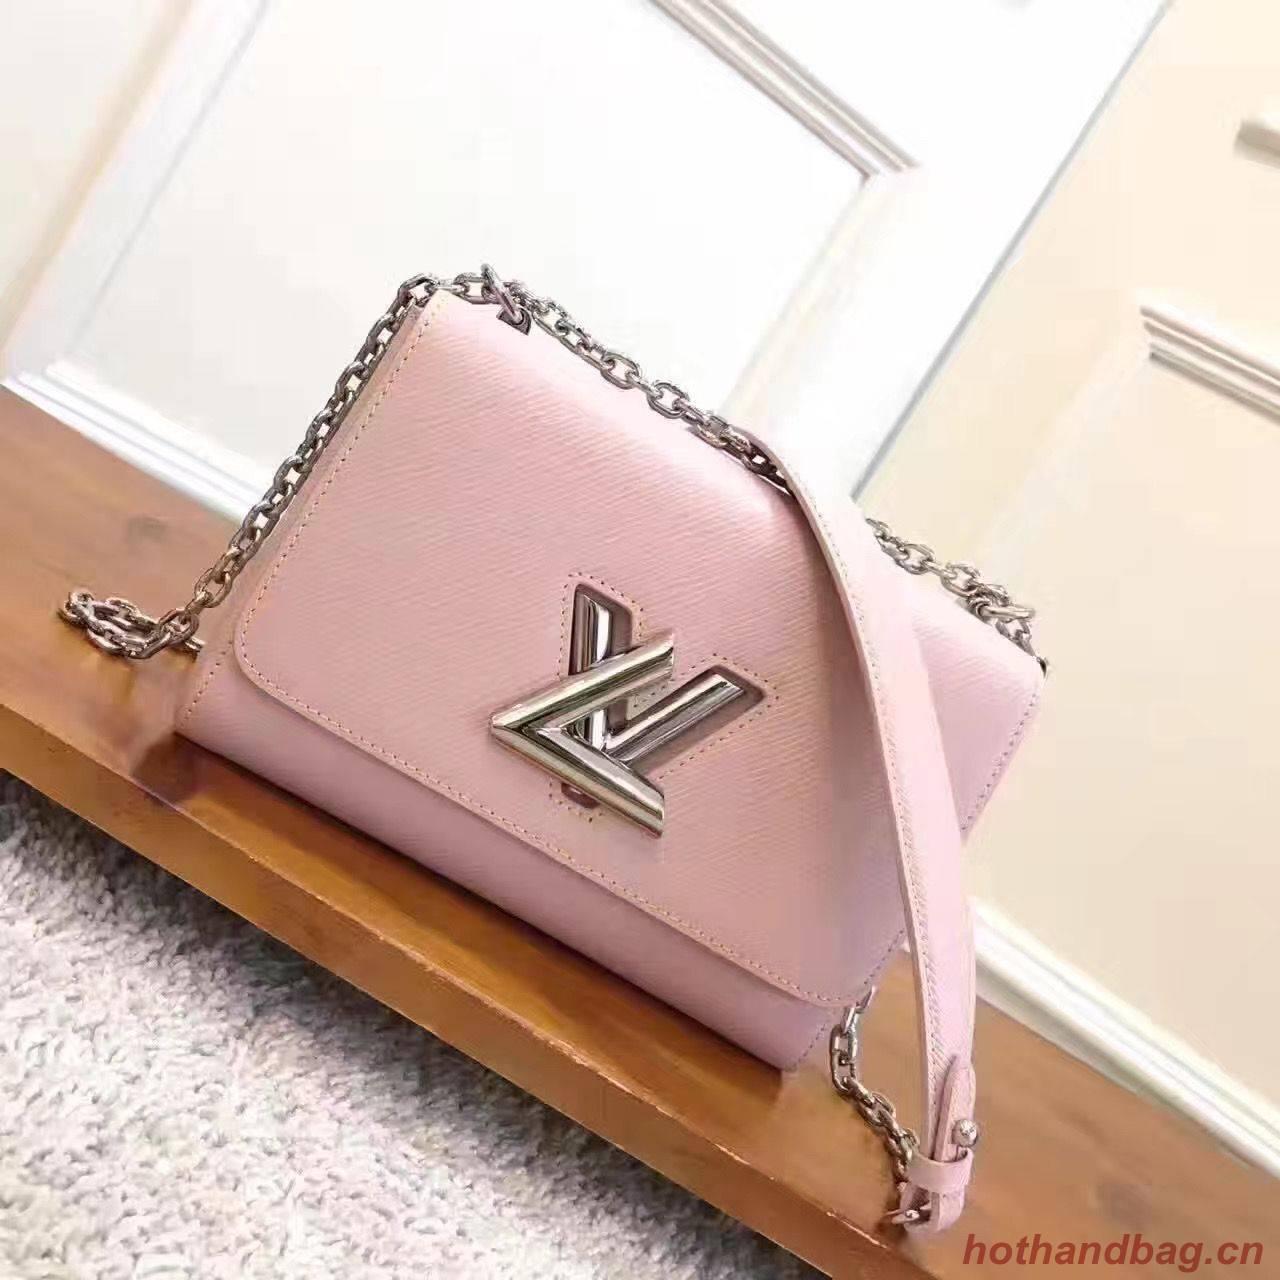 Louis Vuitton Original Epi Leather Twist MM M50380 Pink